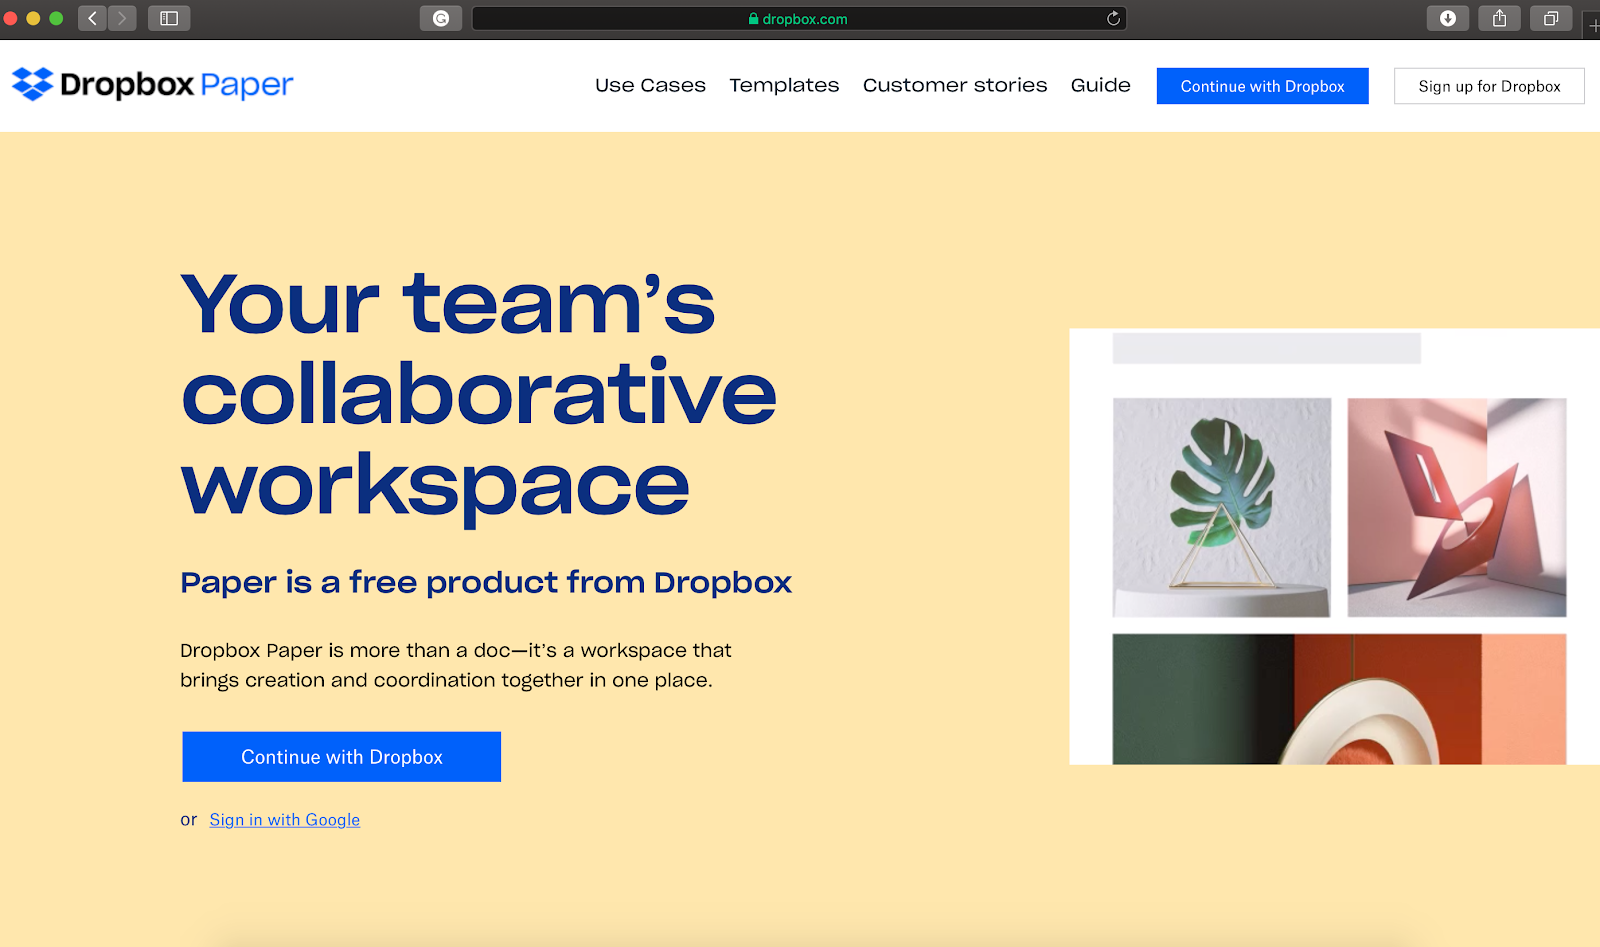 dropbox paper homepage